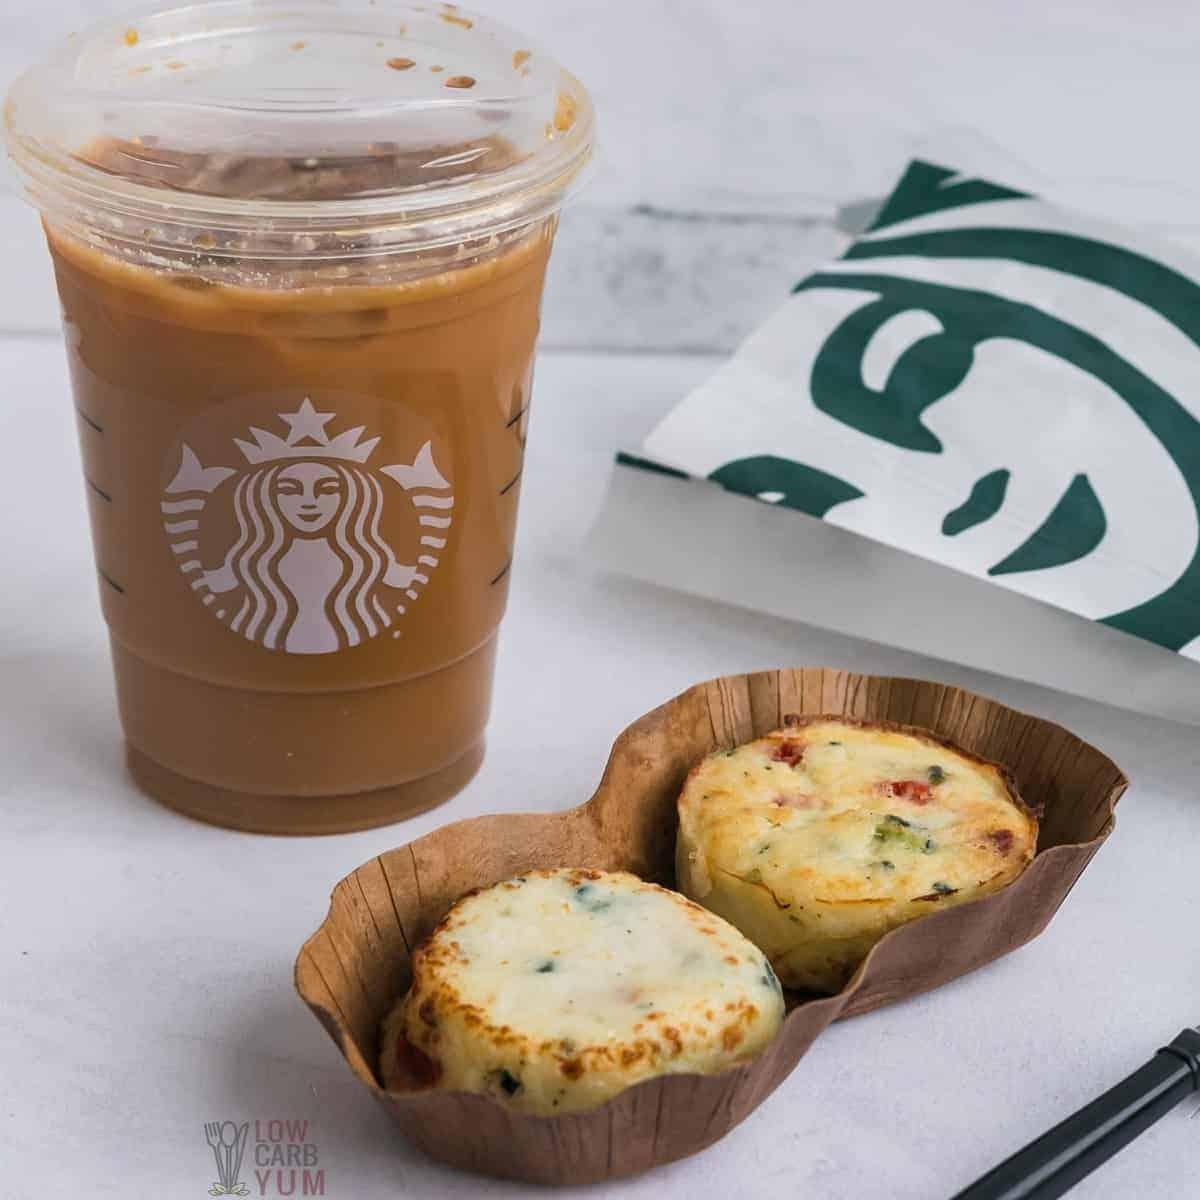 keto starbucks coffee food menu order